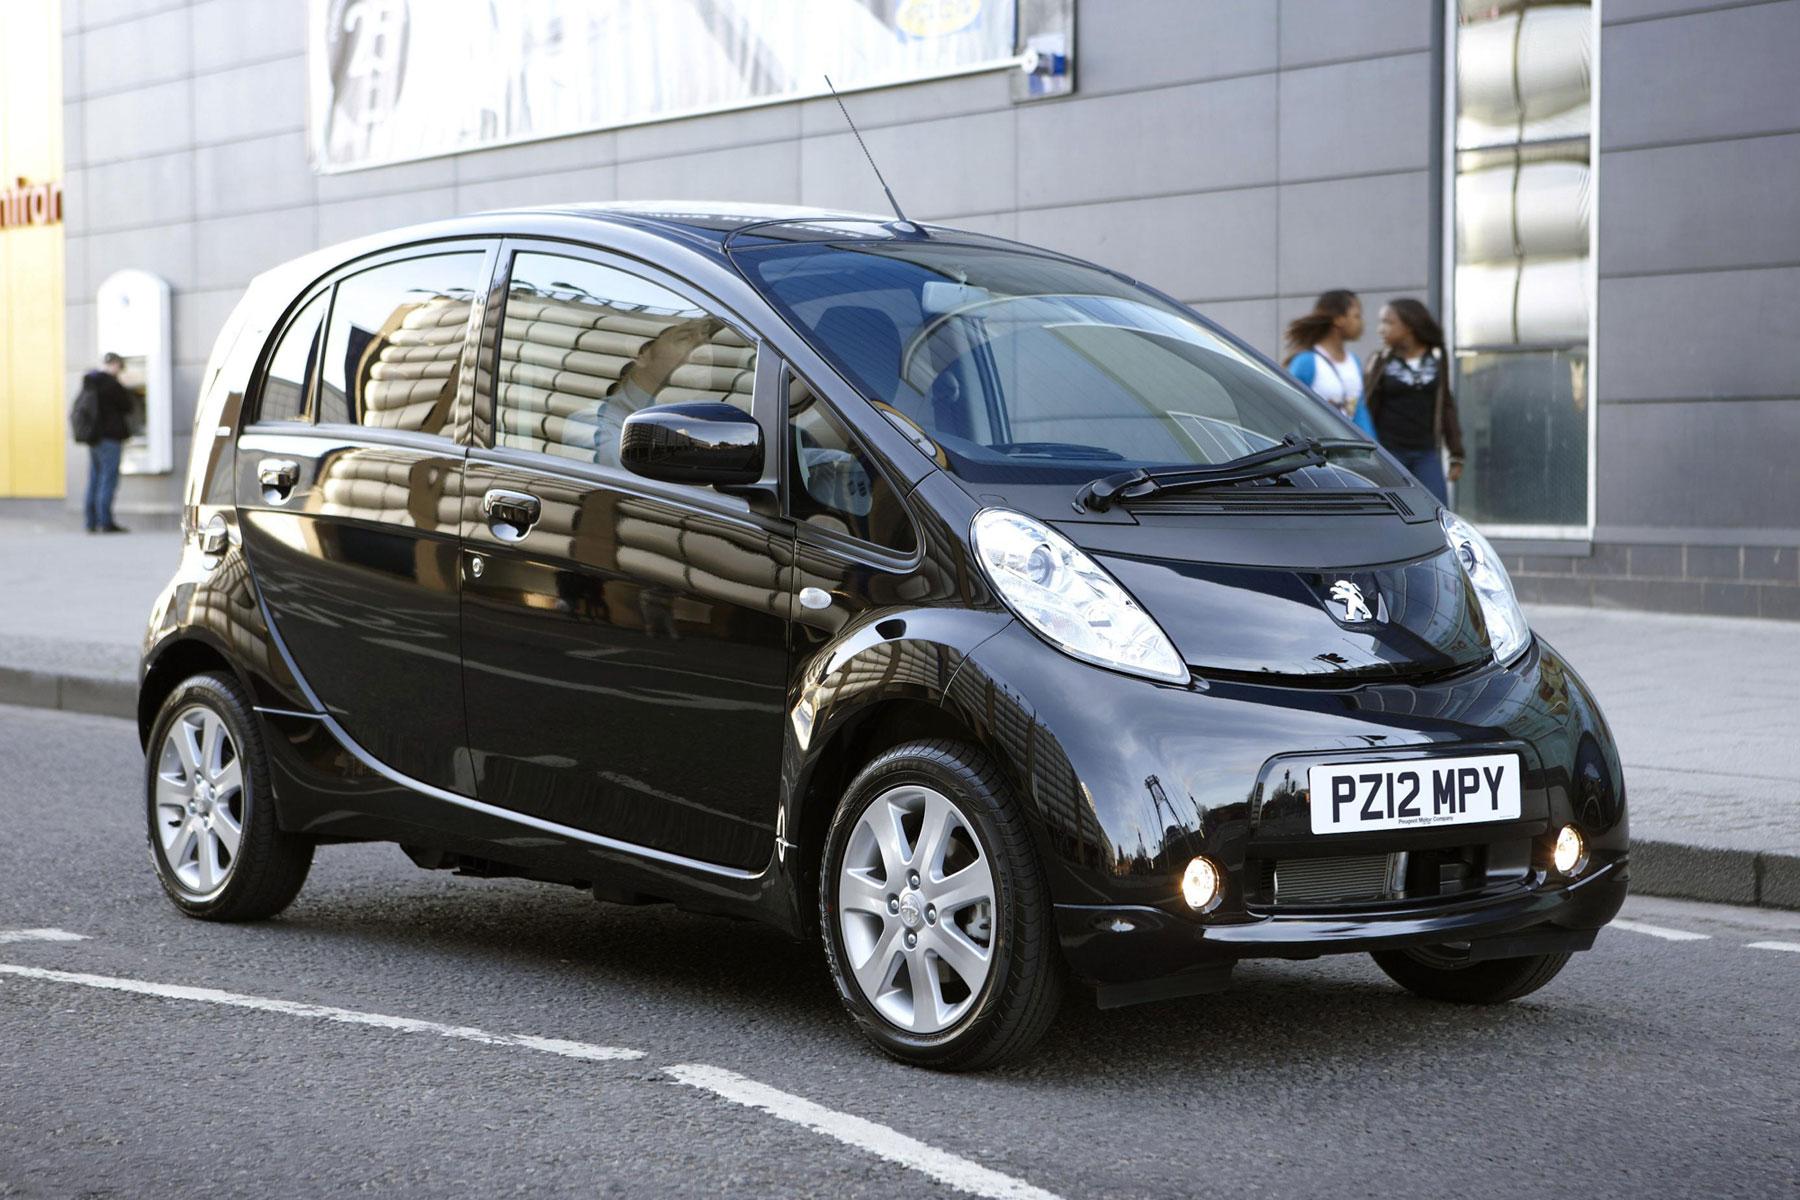 Peugeot iON £11,995